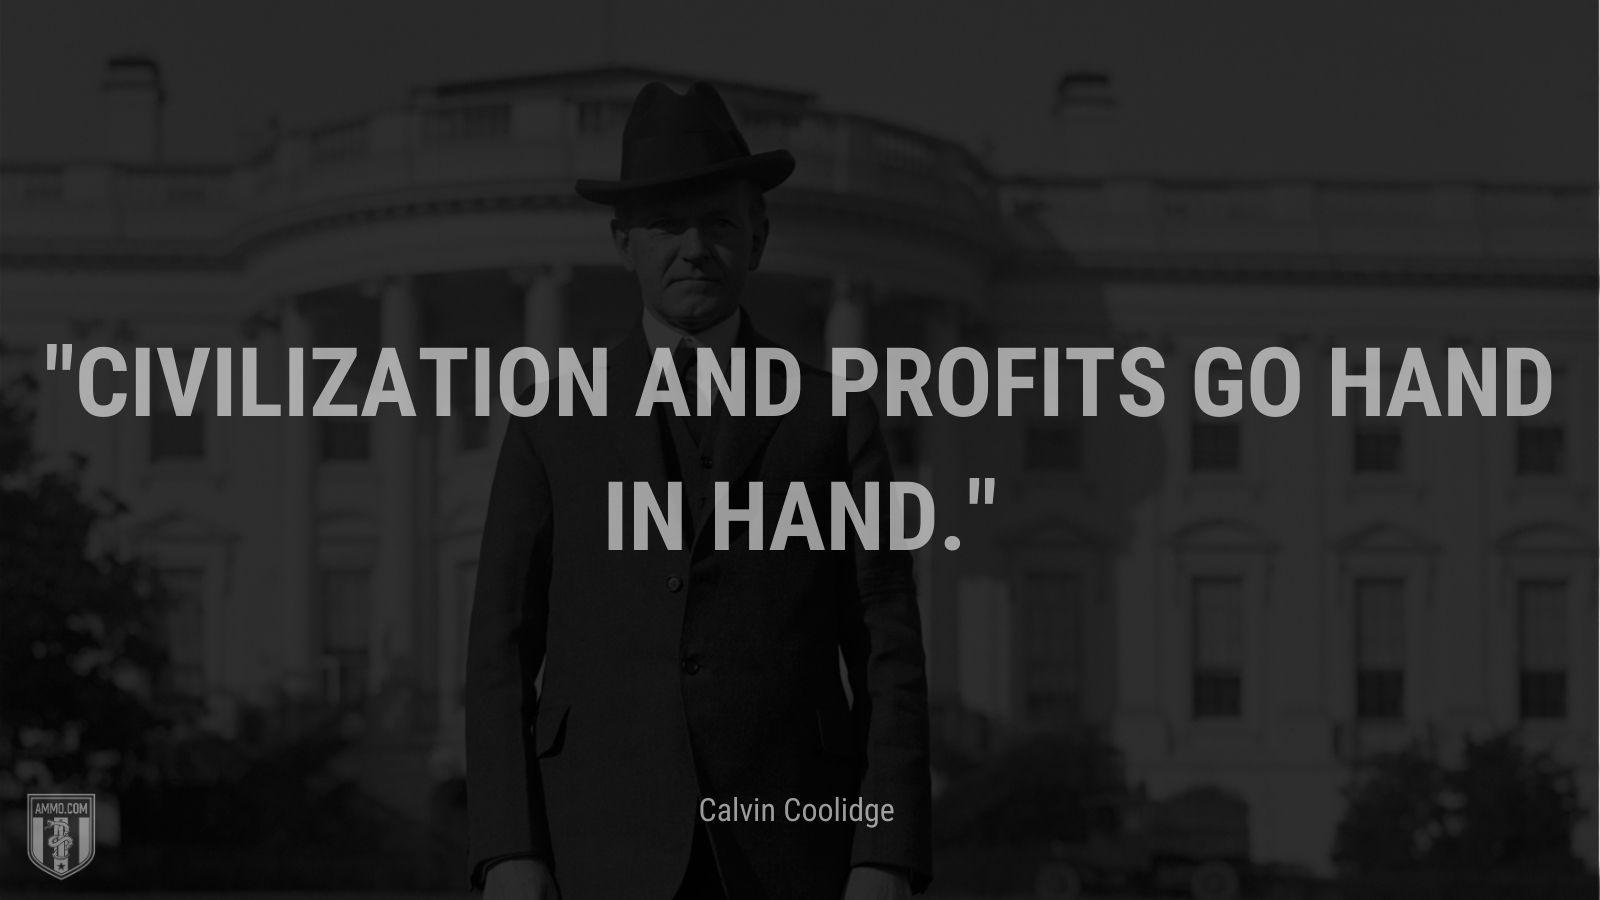 """Civilization and profits go hand in hand."" - Calvin Coolidge"